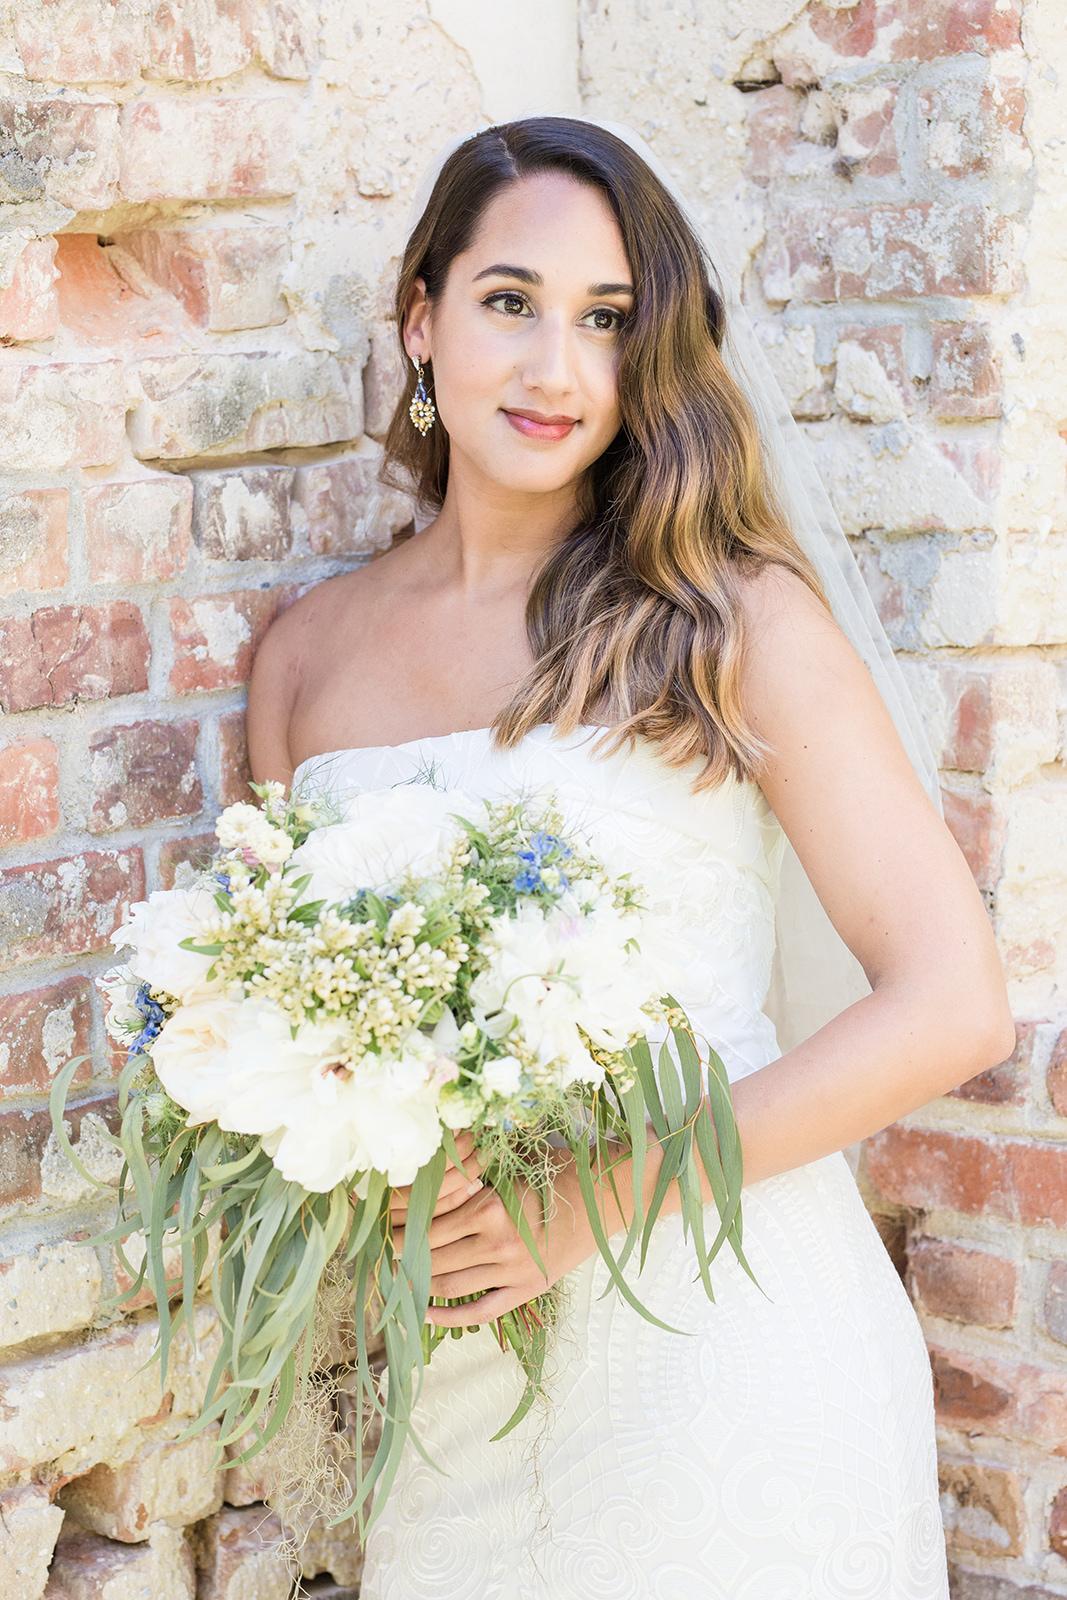 Natasha's Bridal Portraits at the Old Sheldon Church Ruins | Palmetto State Weddings